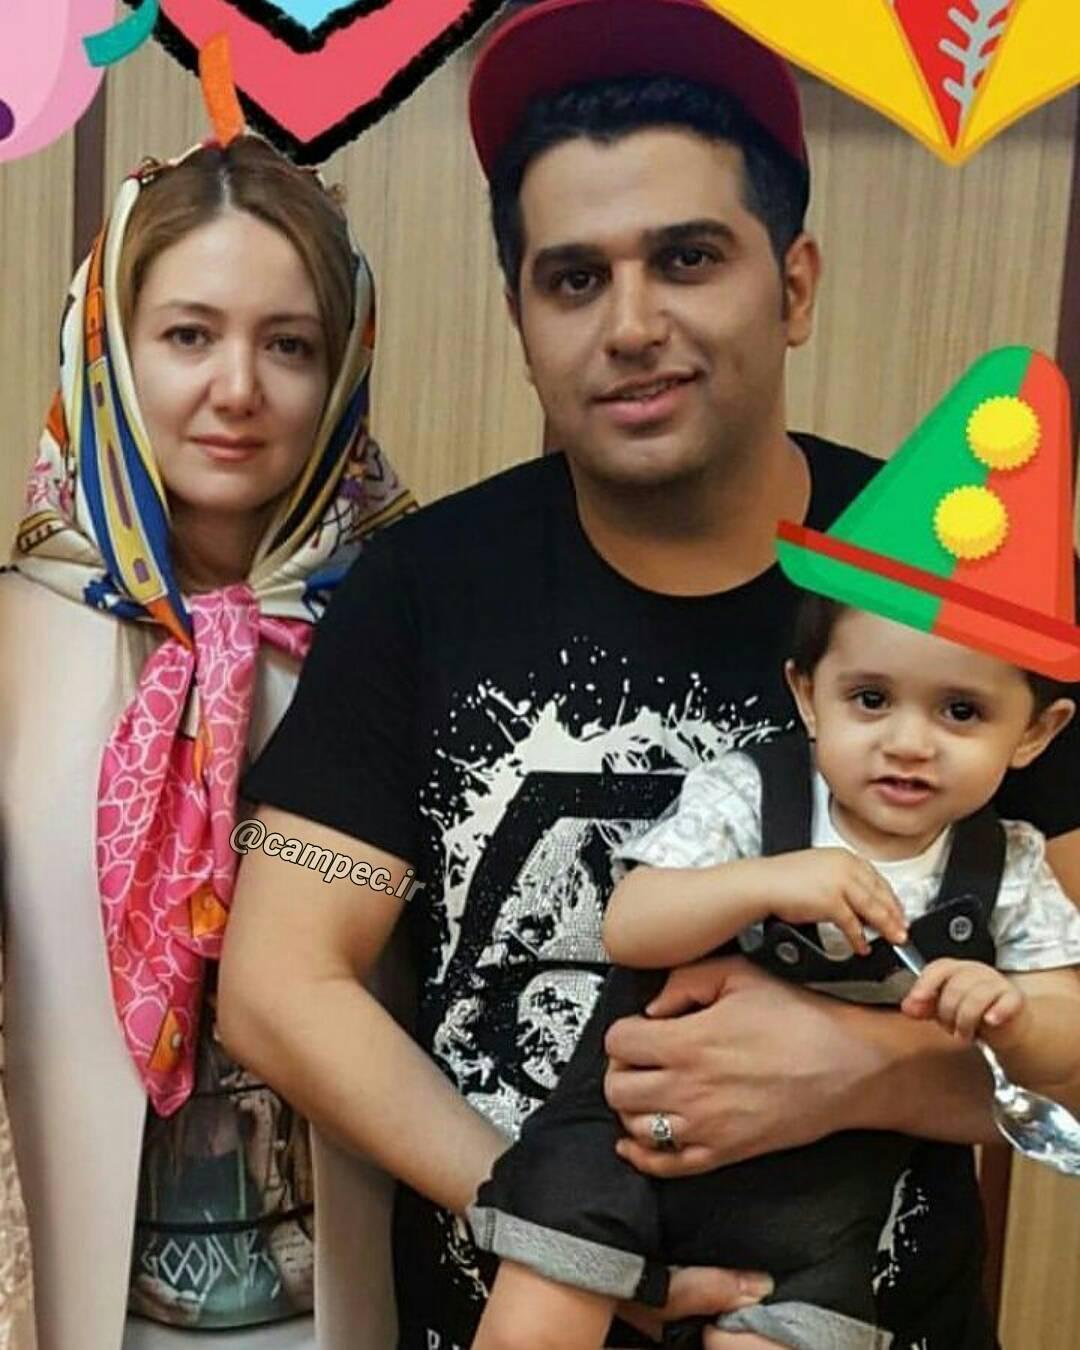 عکس شخصی حمید عسکری با همسر و پسرش